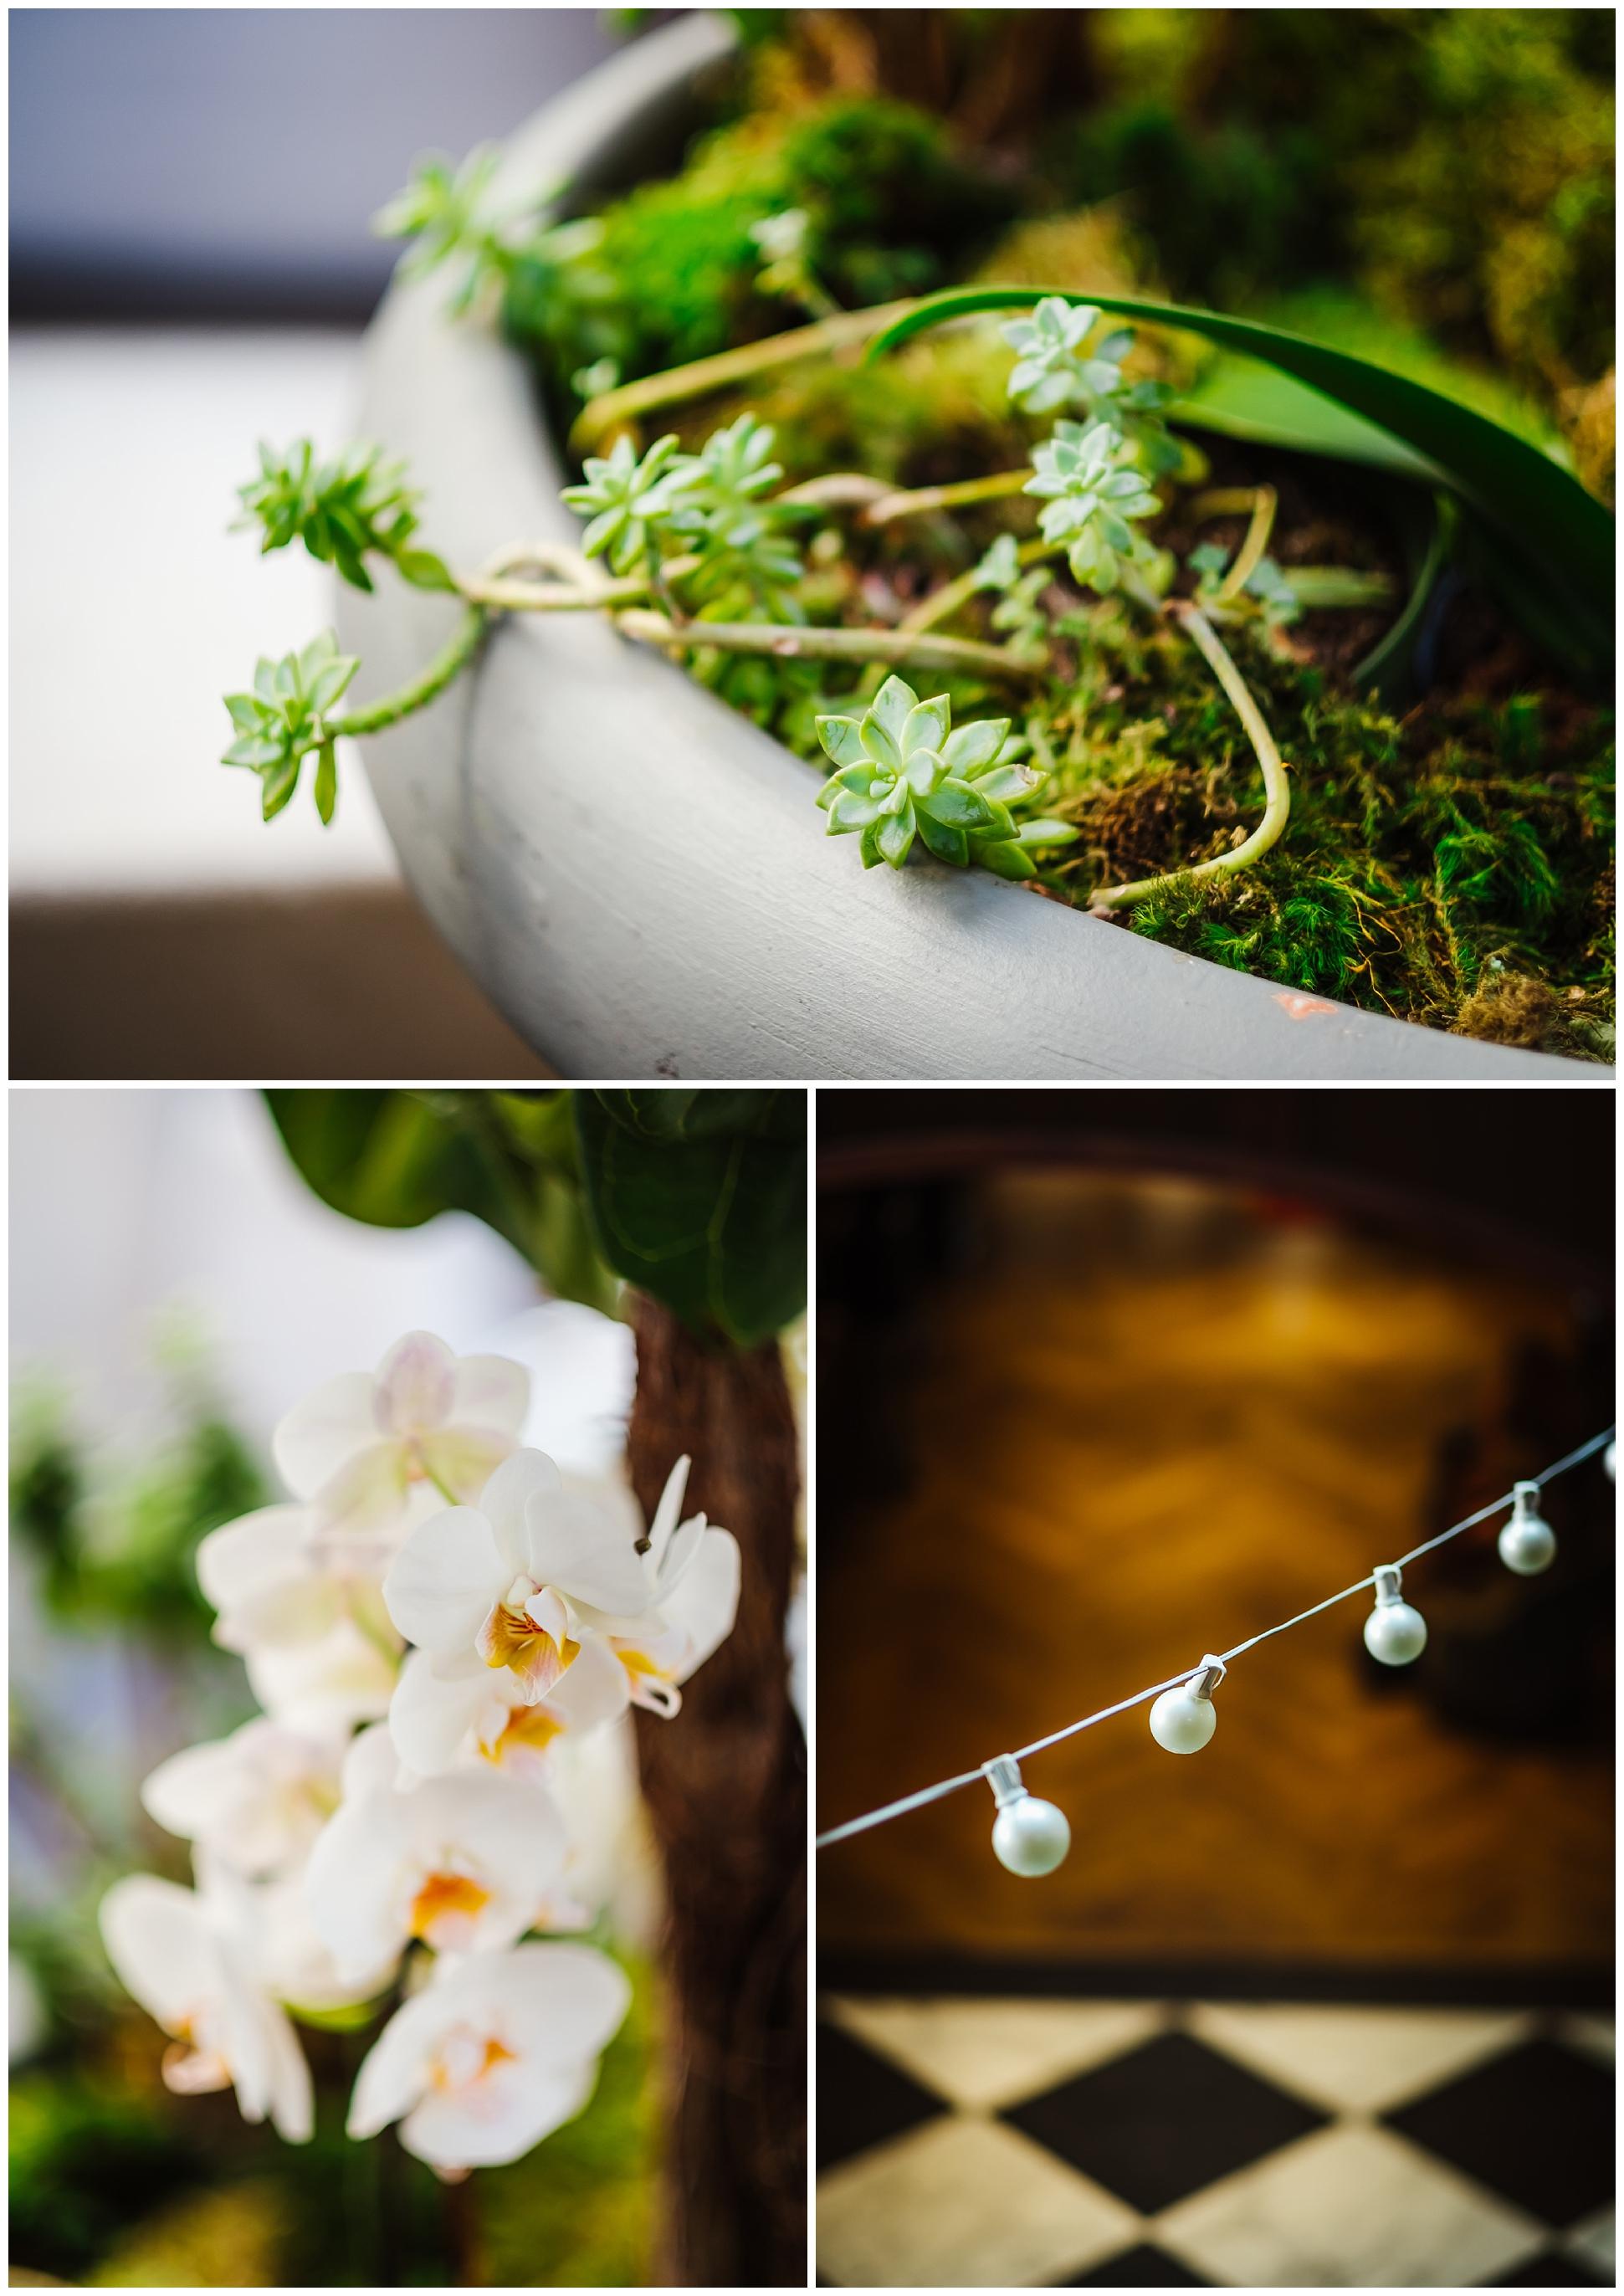 tampa-wedding-photographer-oxford-exchange-garland-candlelight-gold-hayley-paige_0002.jpg